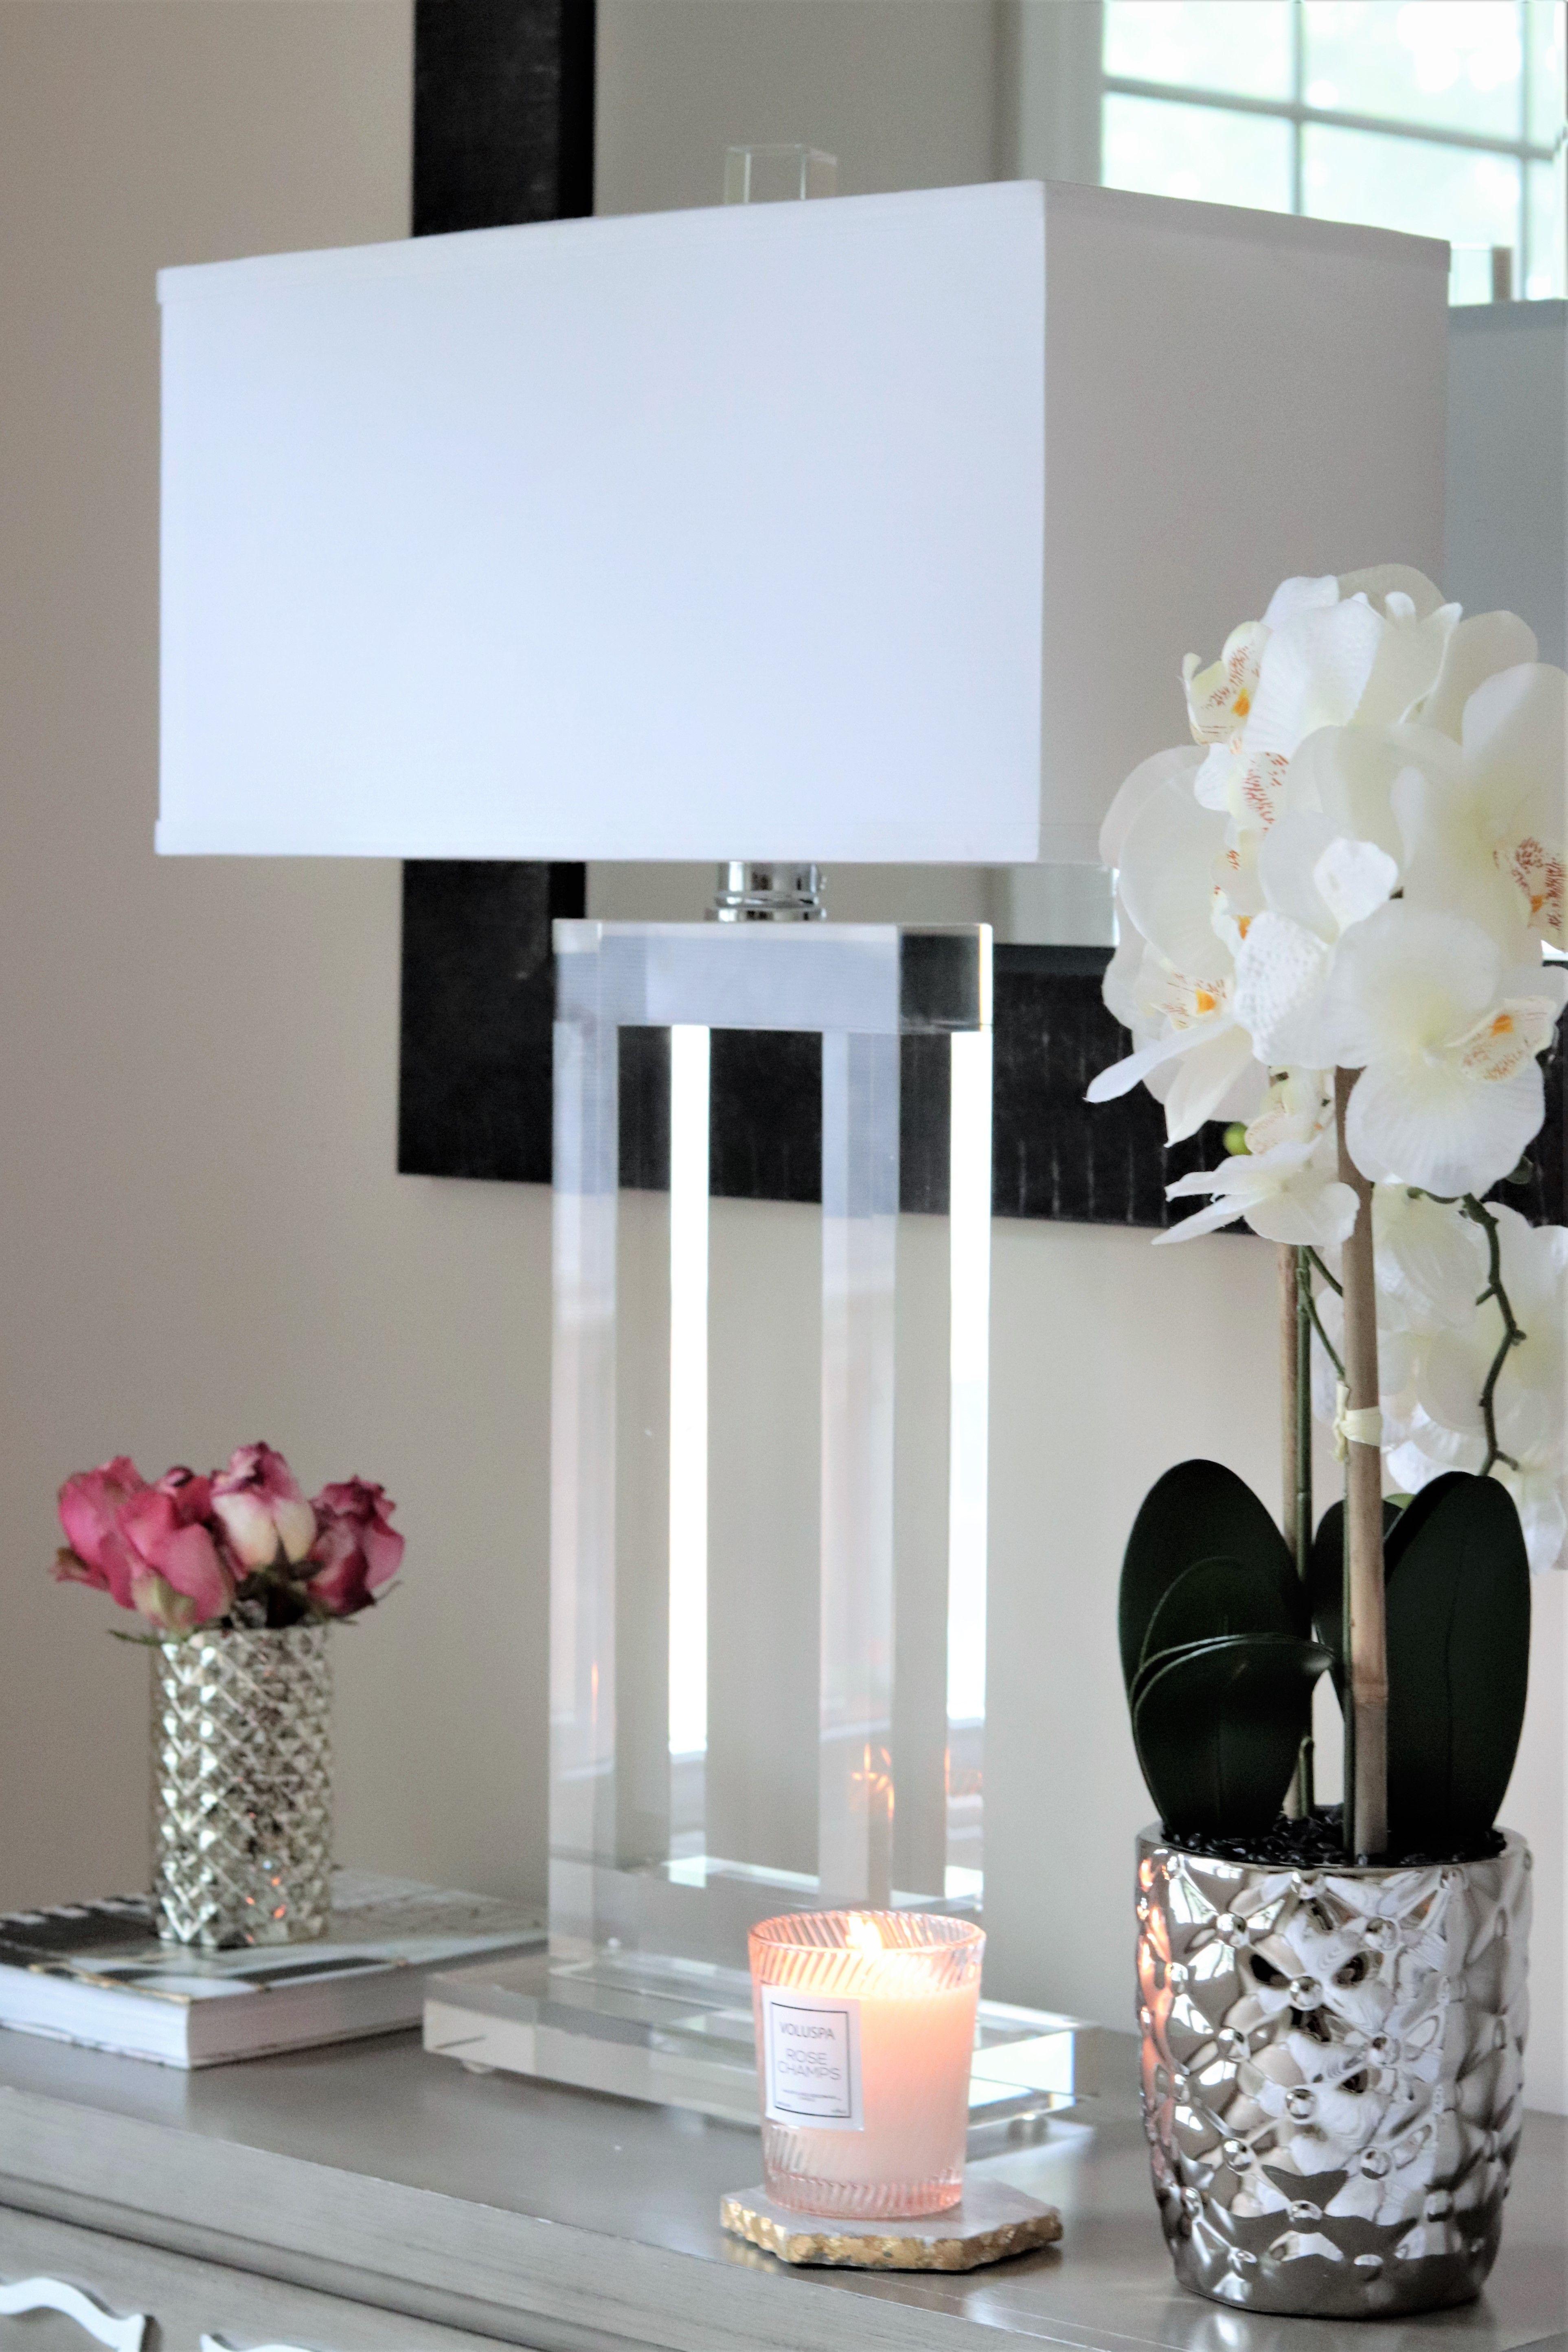 Vienna Full Spectrum Window Modern Crystal Table Lamp 3m960